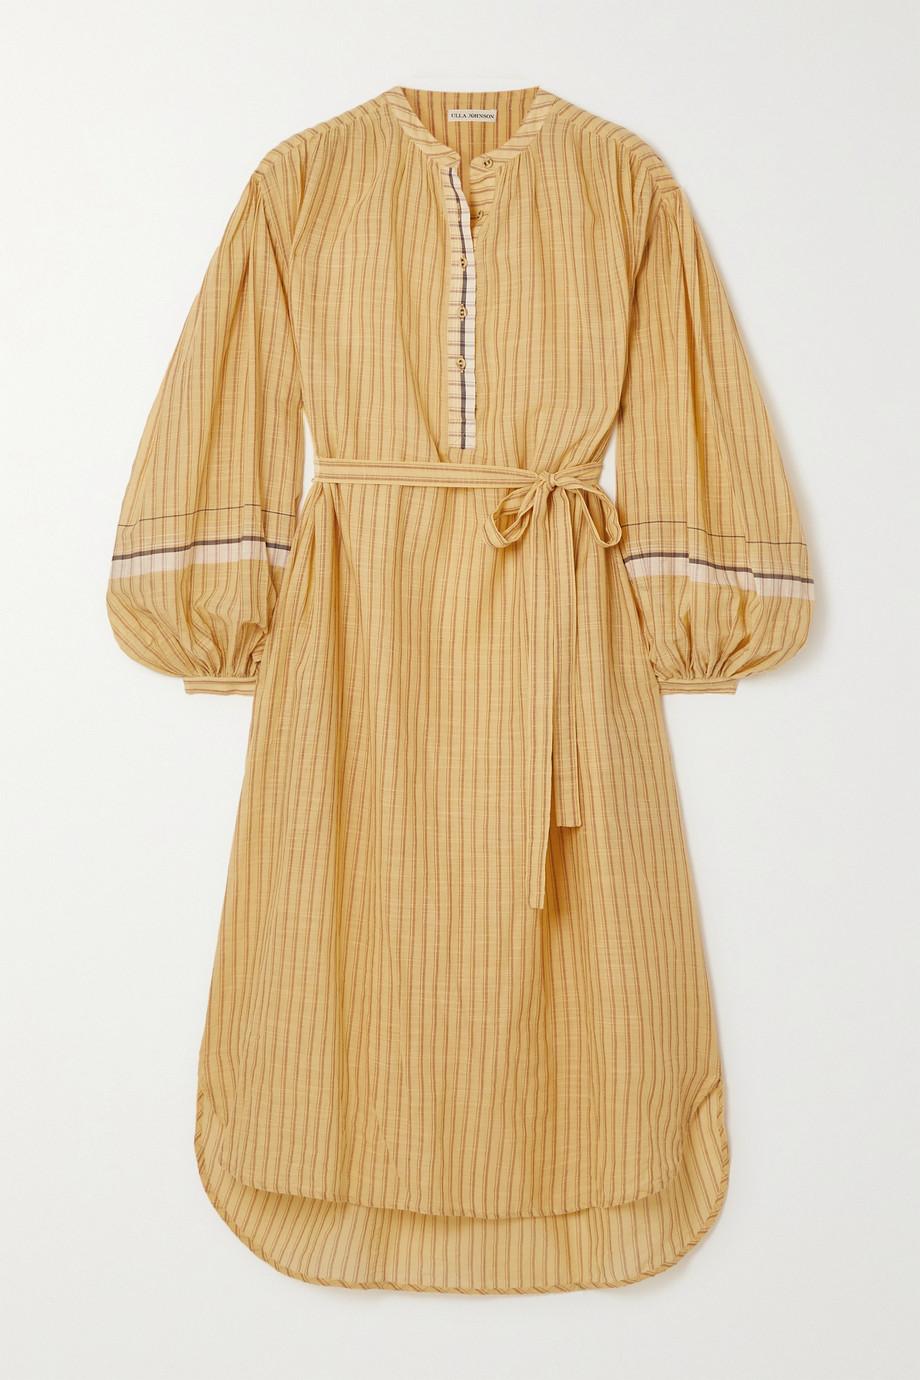 Ulla Johnson Rabea belted striped cotton midi dress